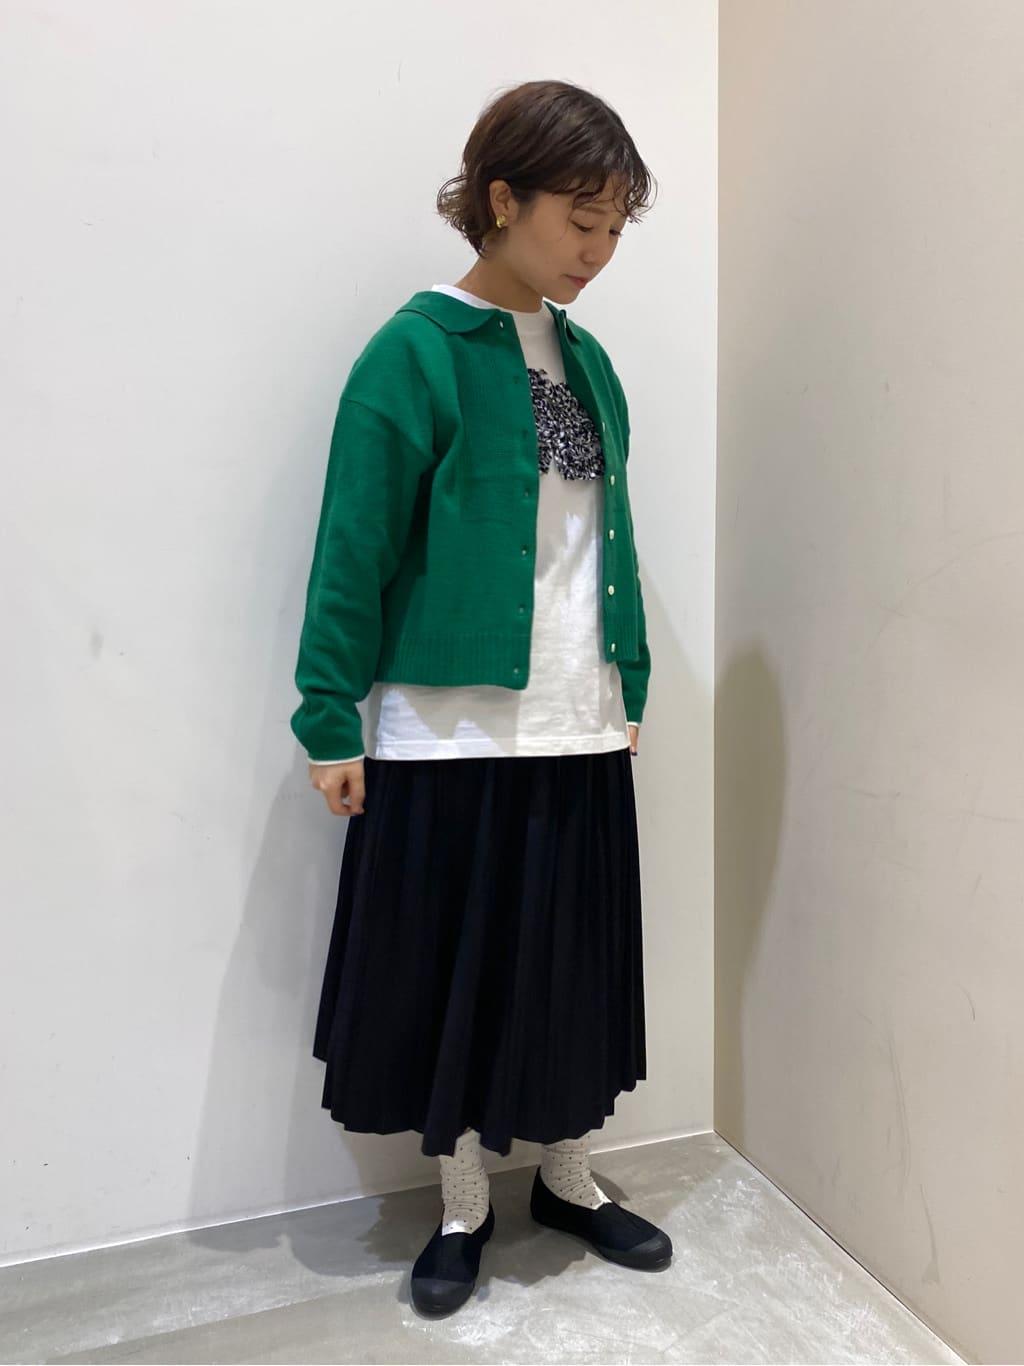 bulle de savon 阪急西宮ガーデンズ 身長:149cm 2021.09.10